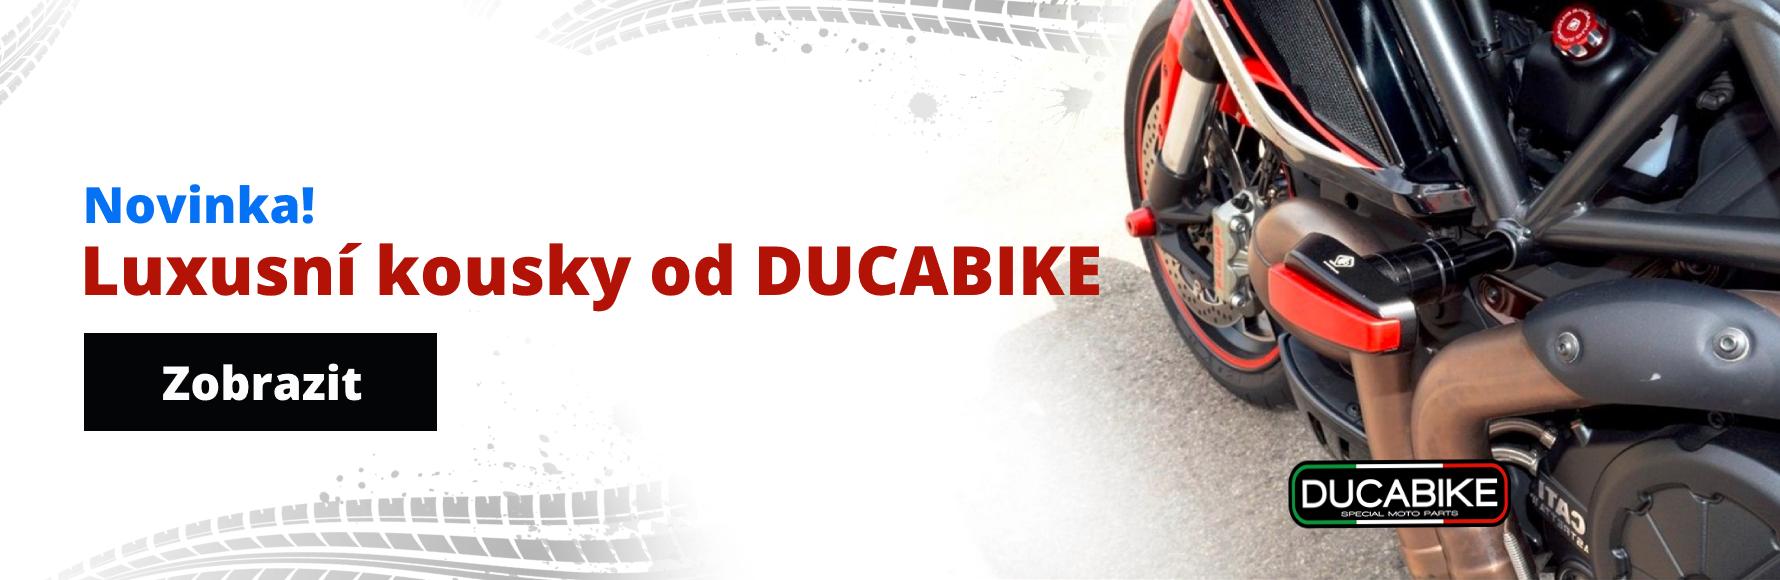 Novinky od Ducabike